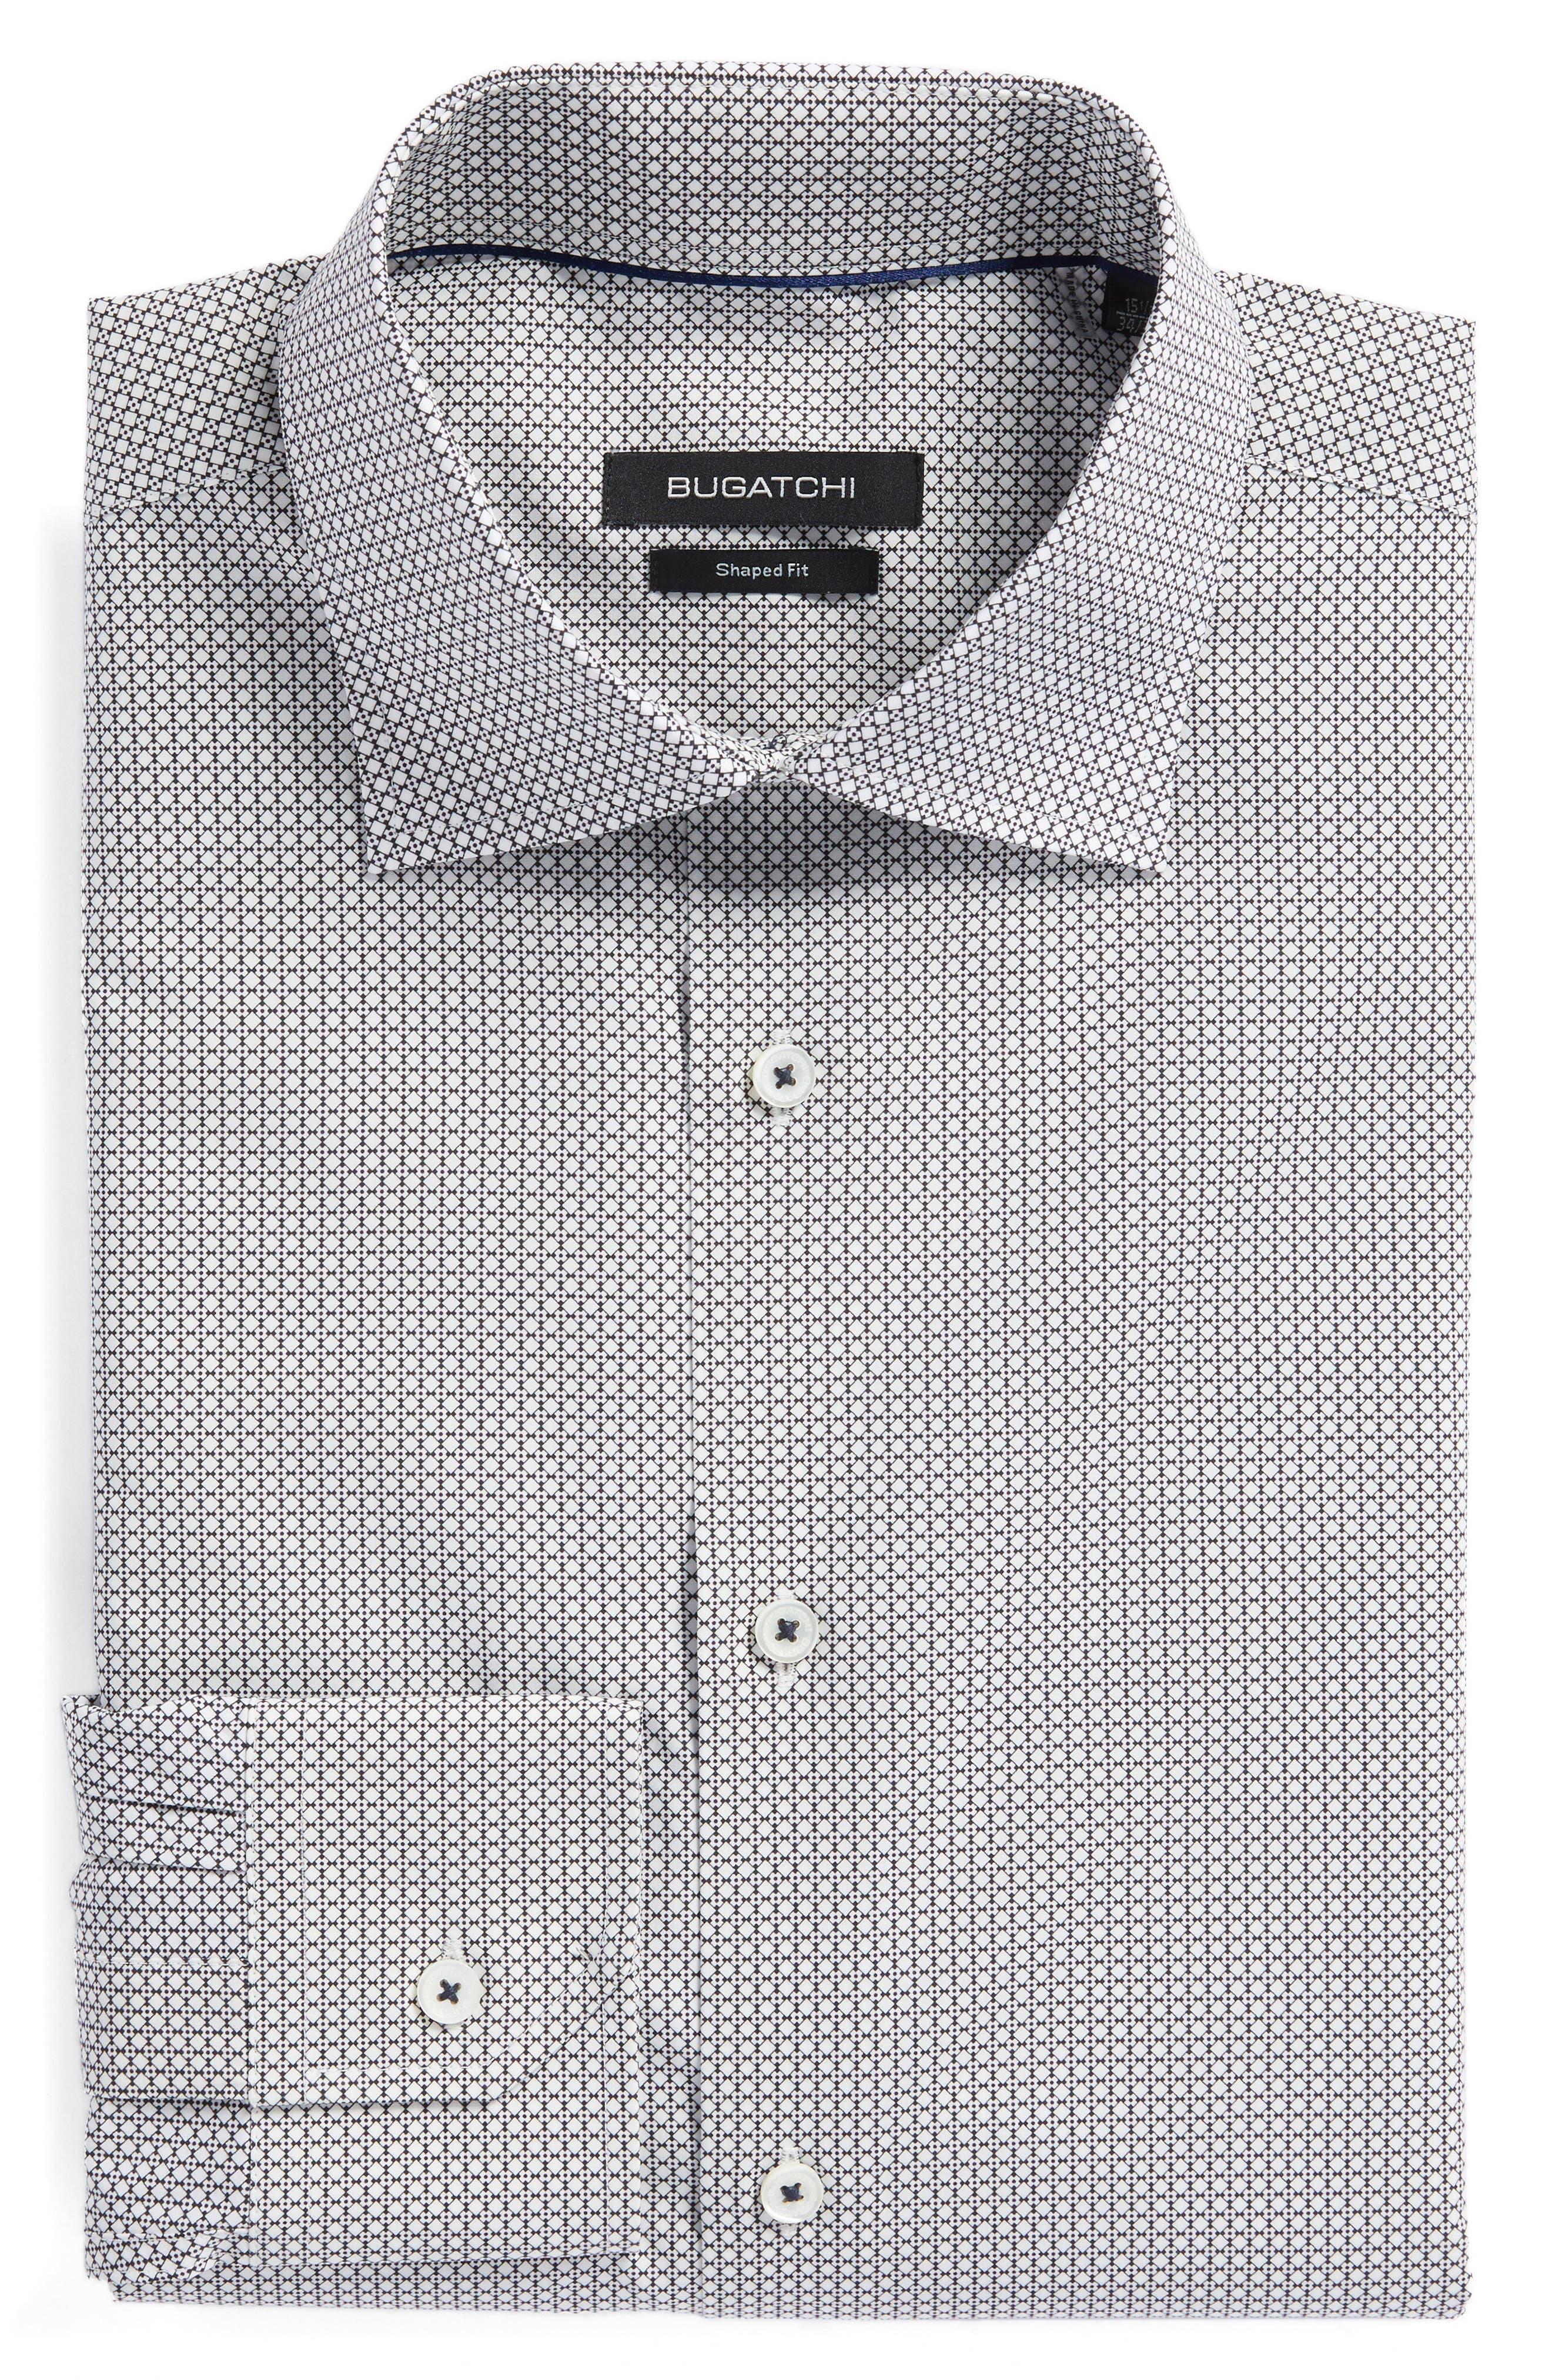 Trim Fit Print Dress Shirt,                             Alternate thumbnail 6, color,                             Platinum